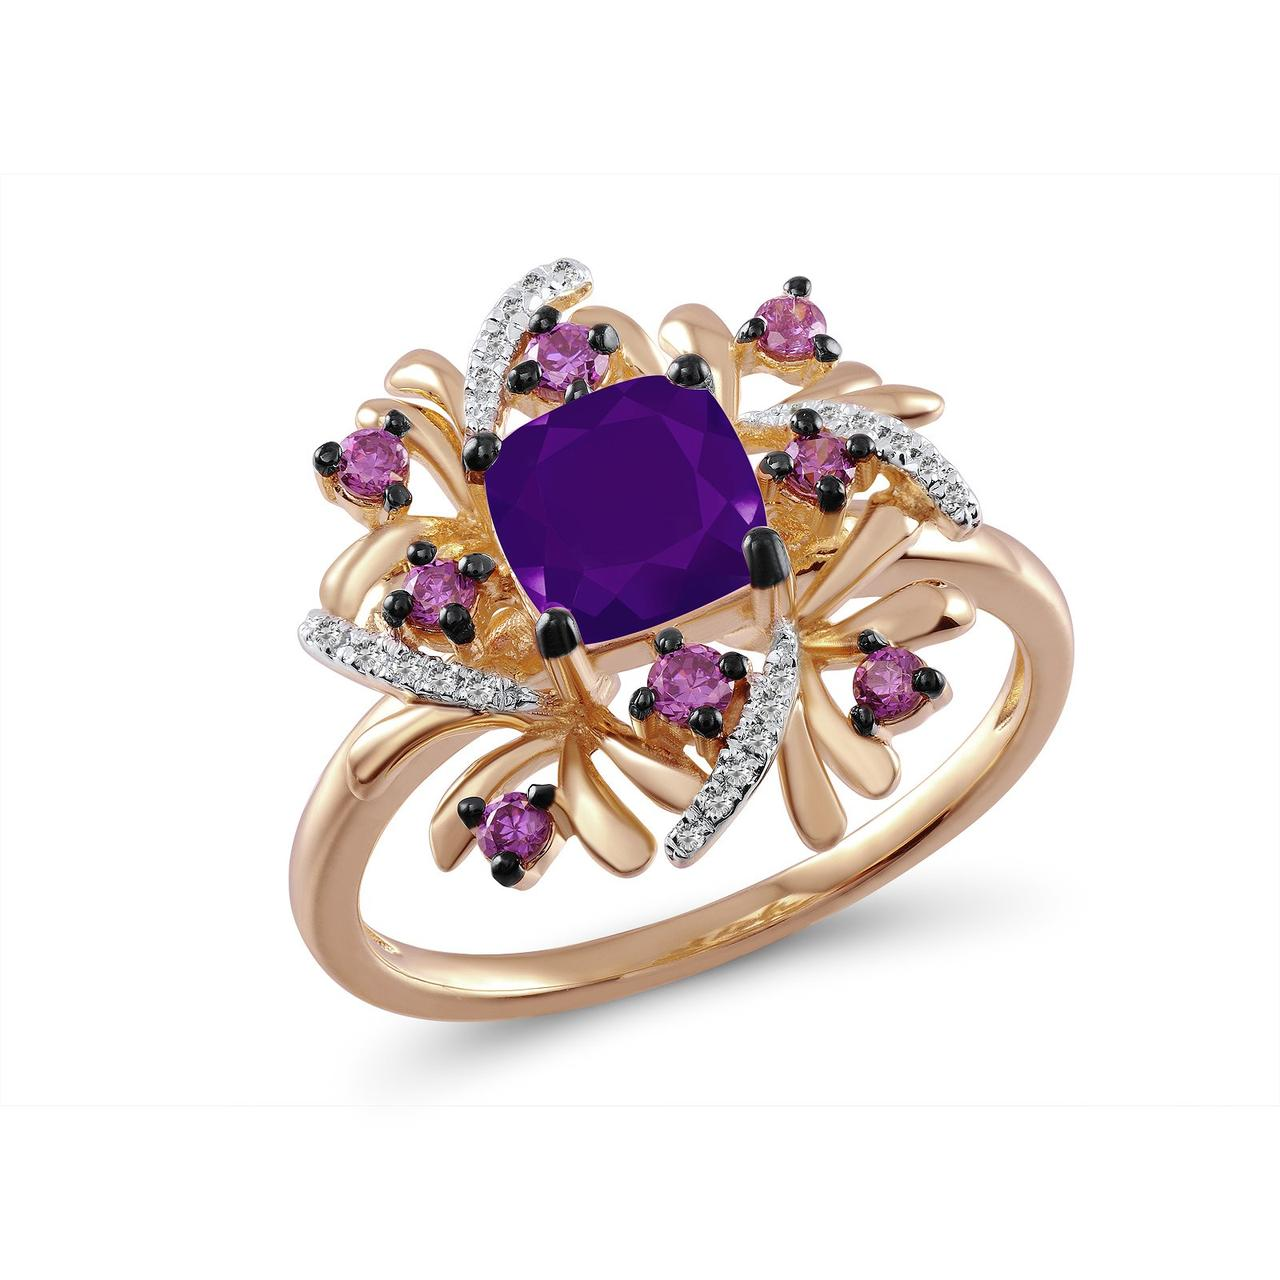 Золотое кольцо с аметистами и бриллиантами, размер 19 (269054)